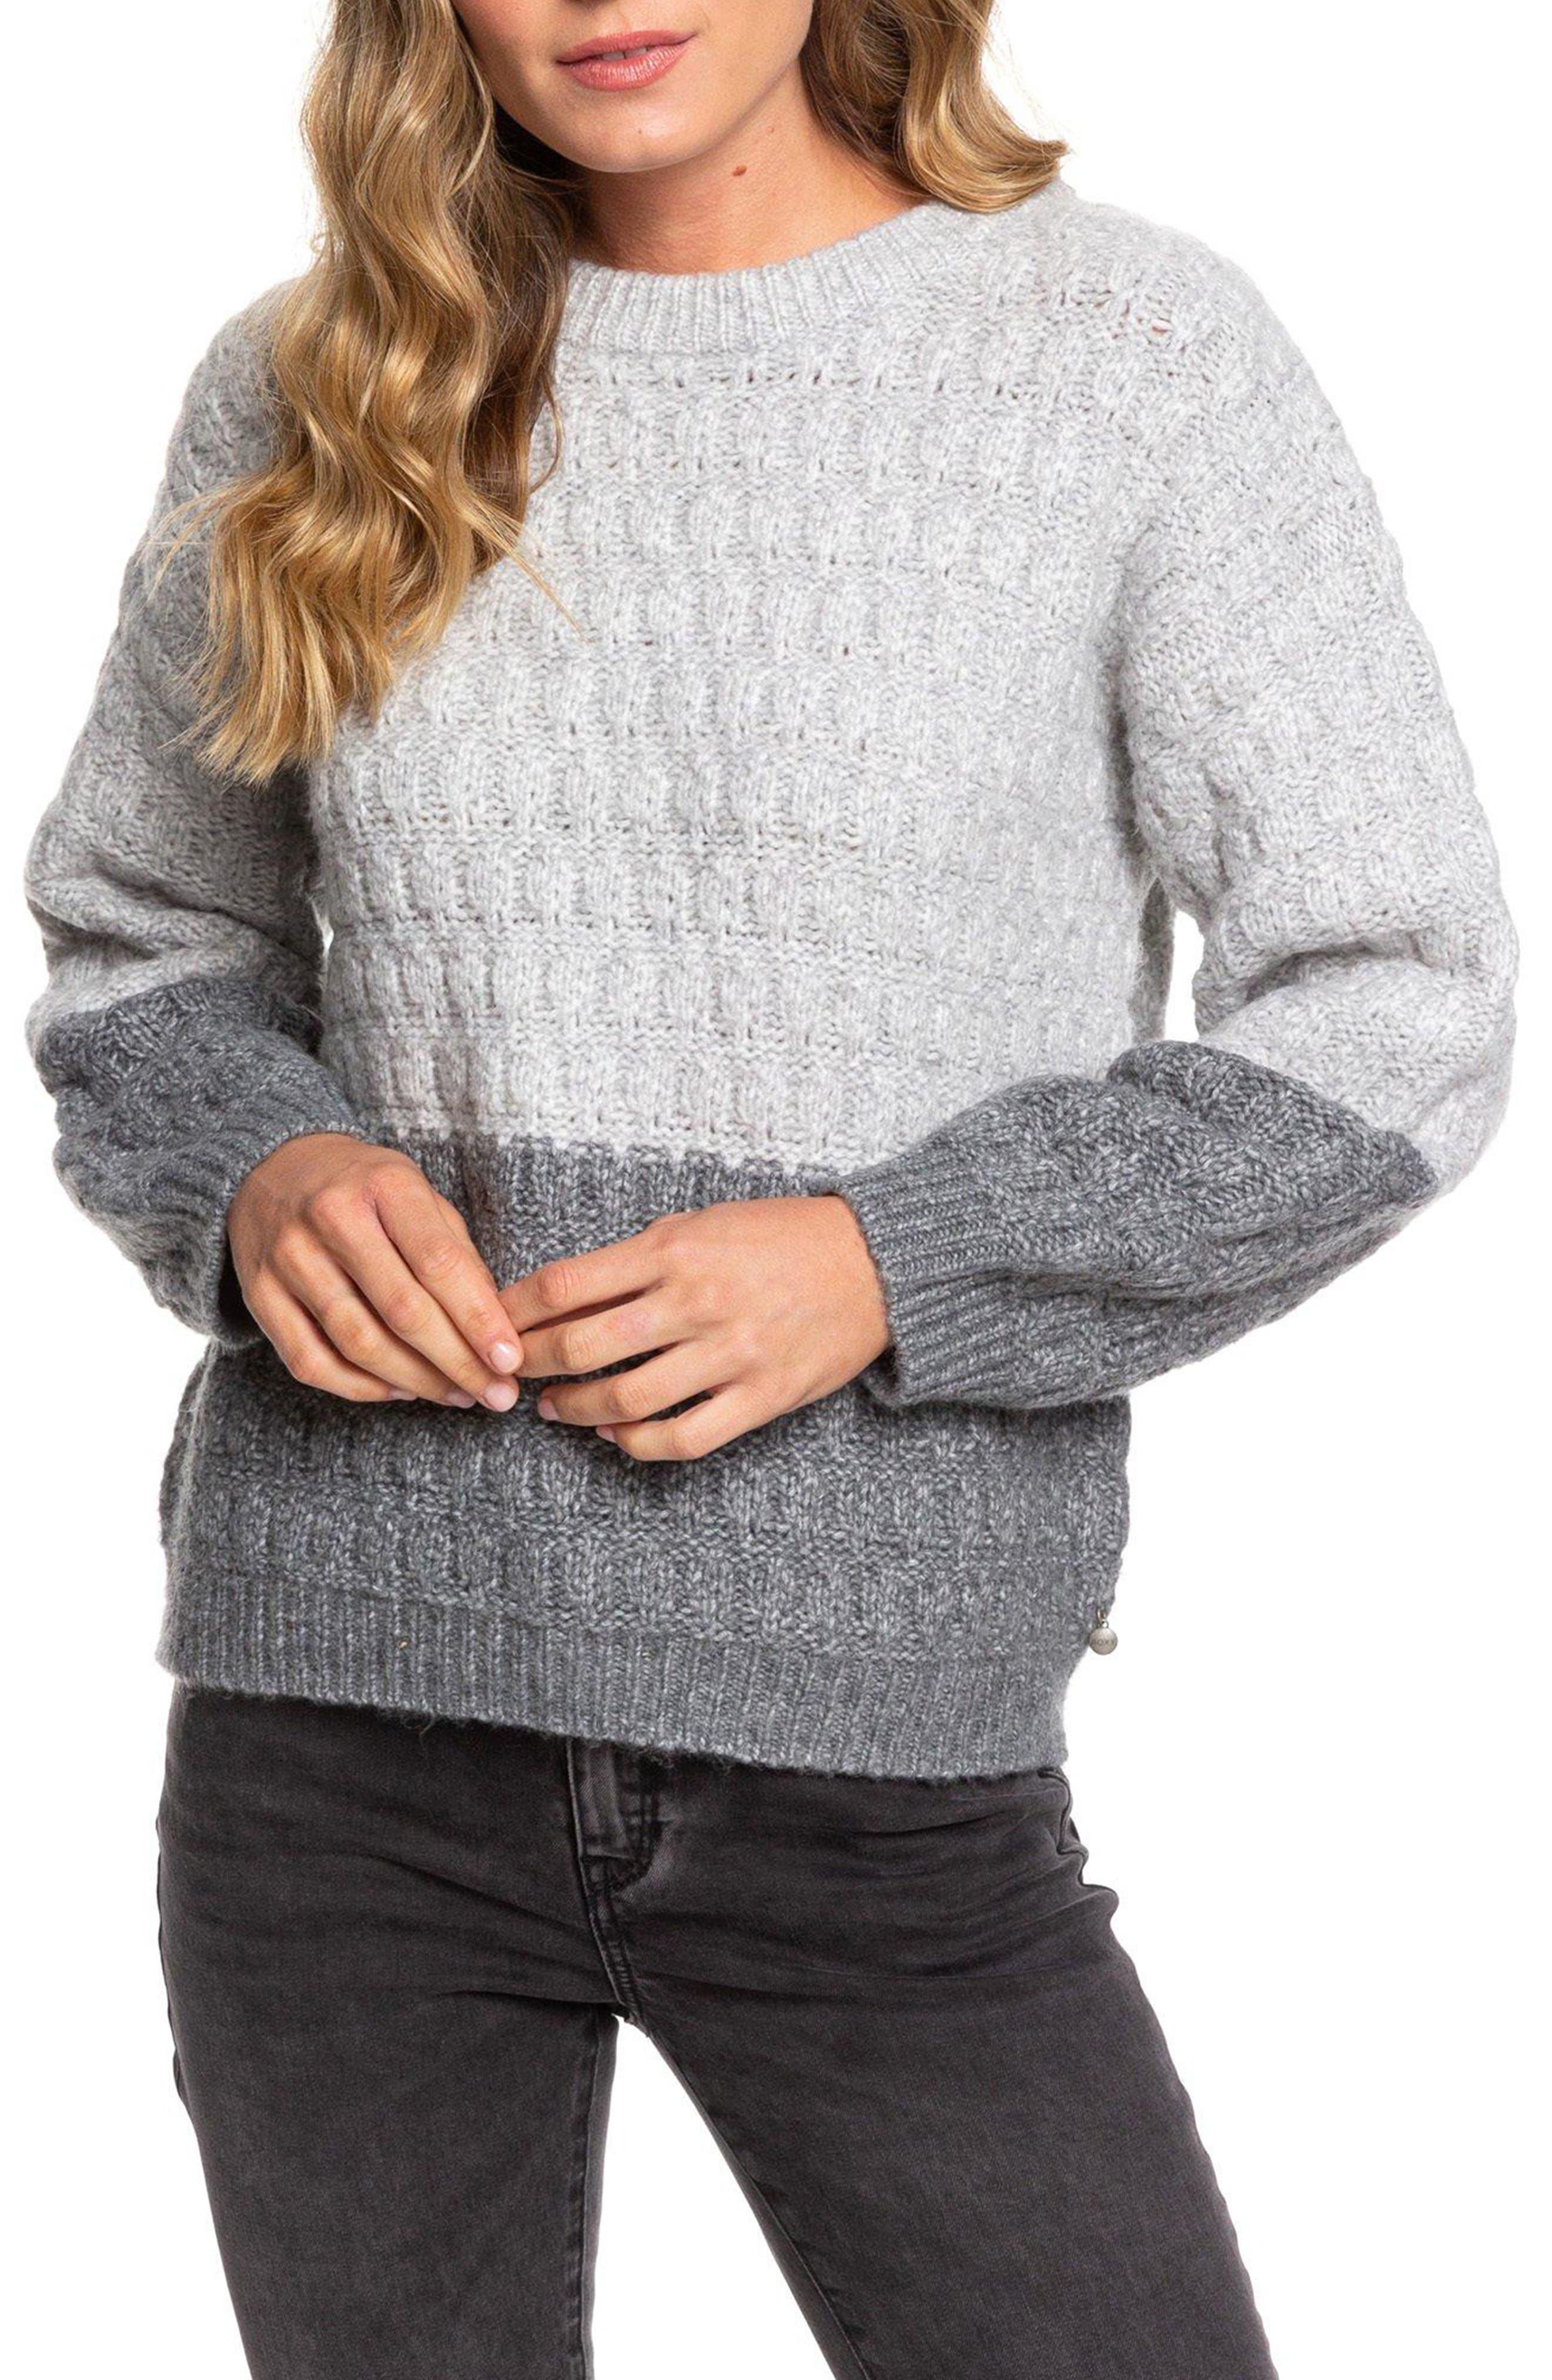 Roxy Womens White Caps Knit Sweater